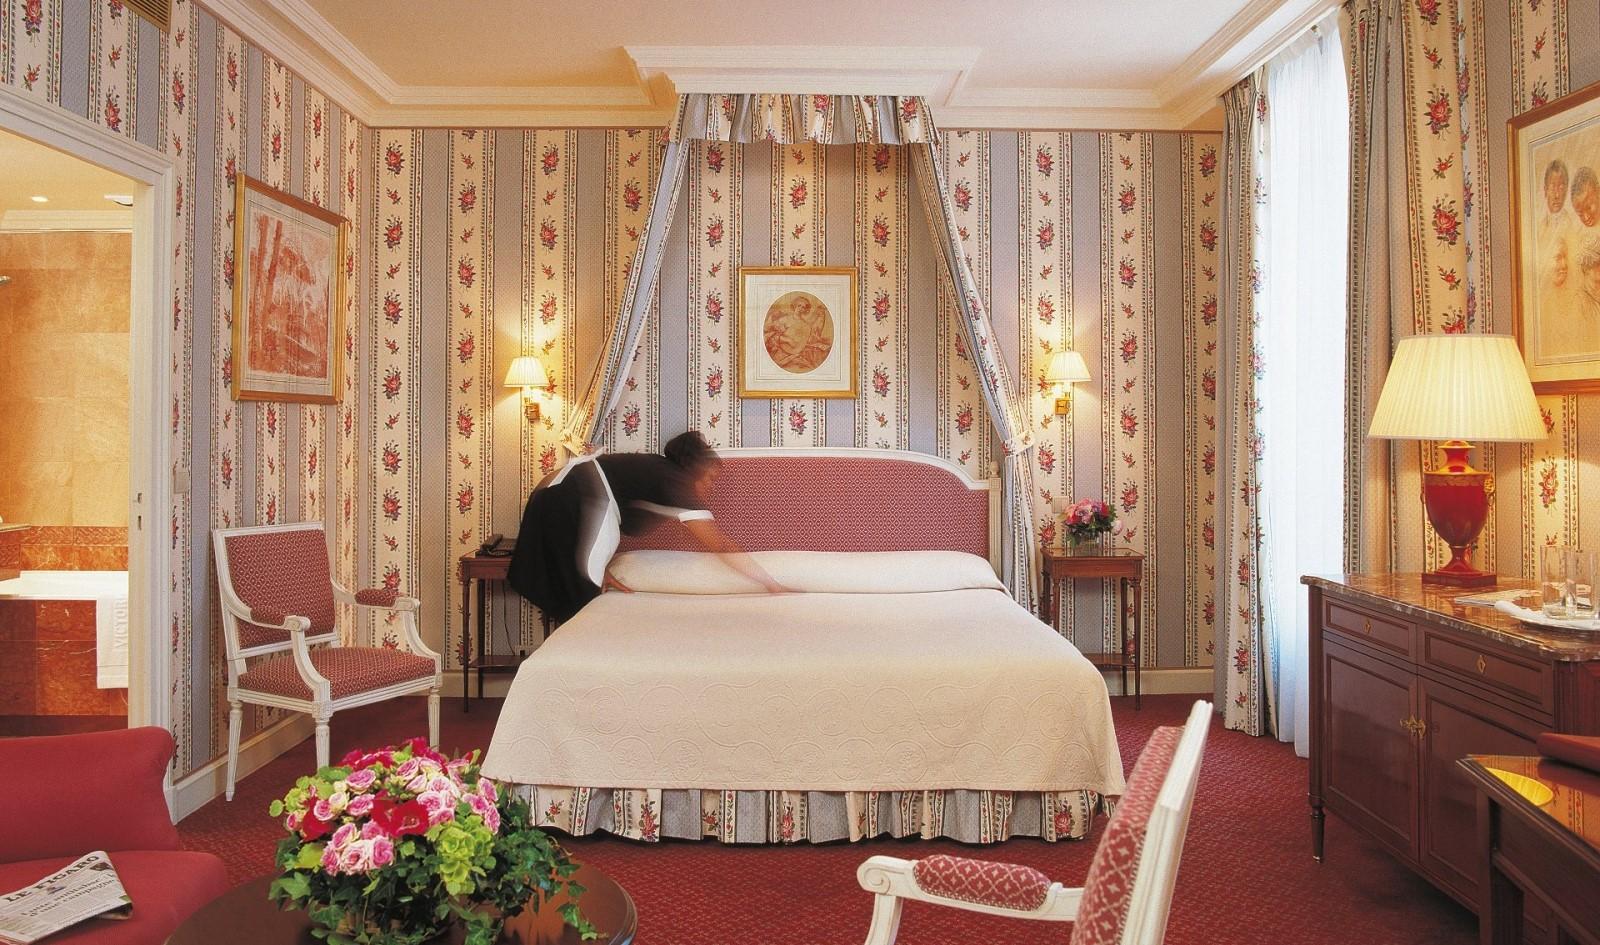 VPH King-Bedded Junior Suite - Crop